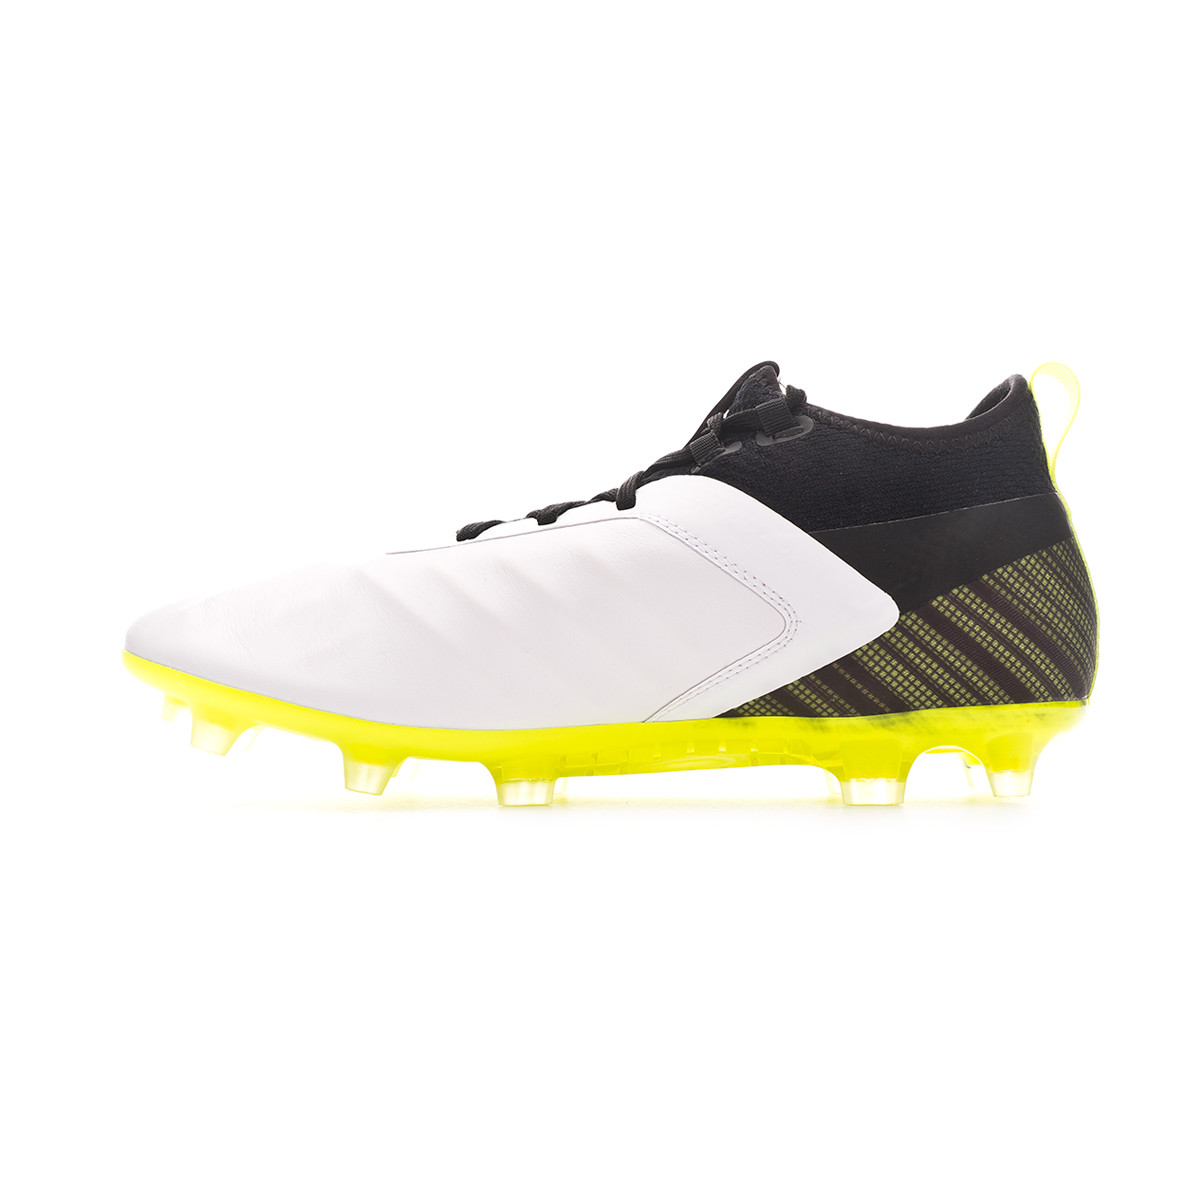 gå online otroliga priser eleganta skor Football Boots Puma One 5.2 FG/AG Puma white-Puma black-Yellow ...